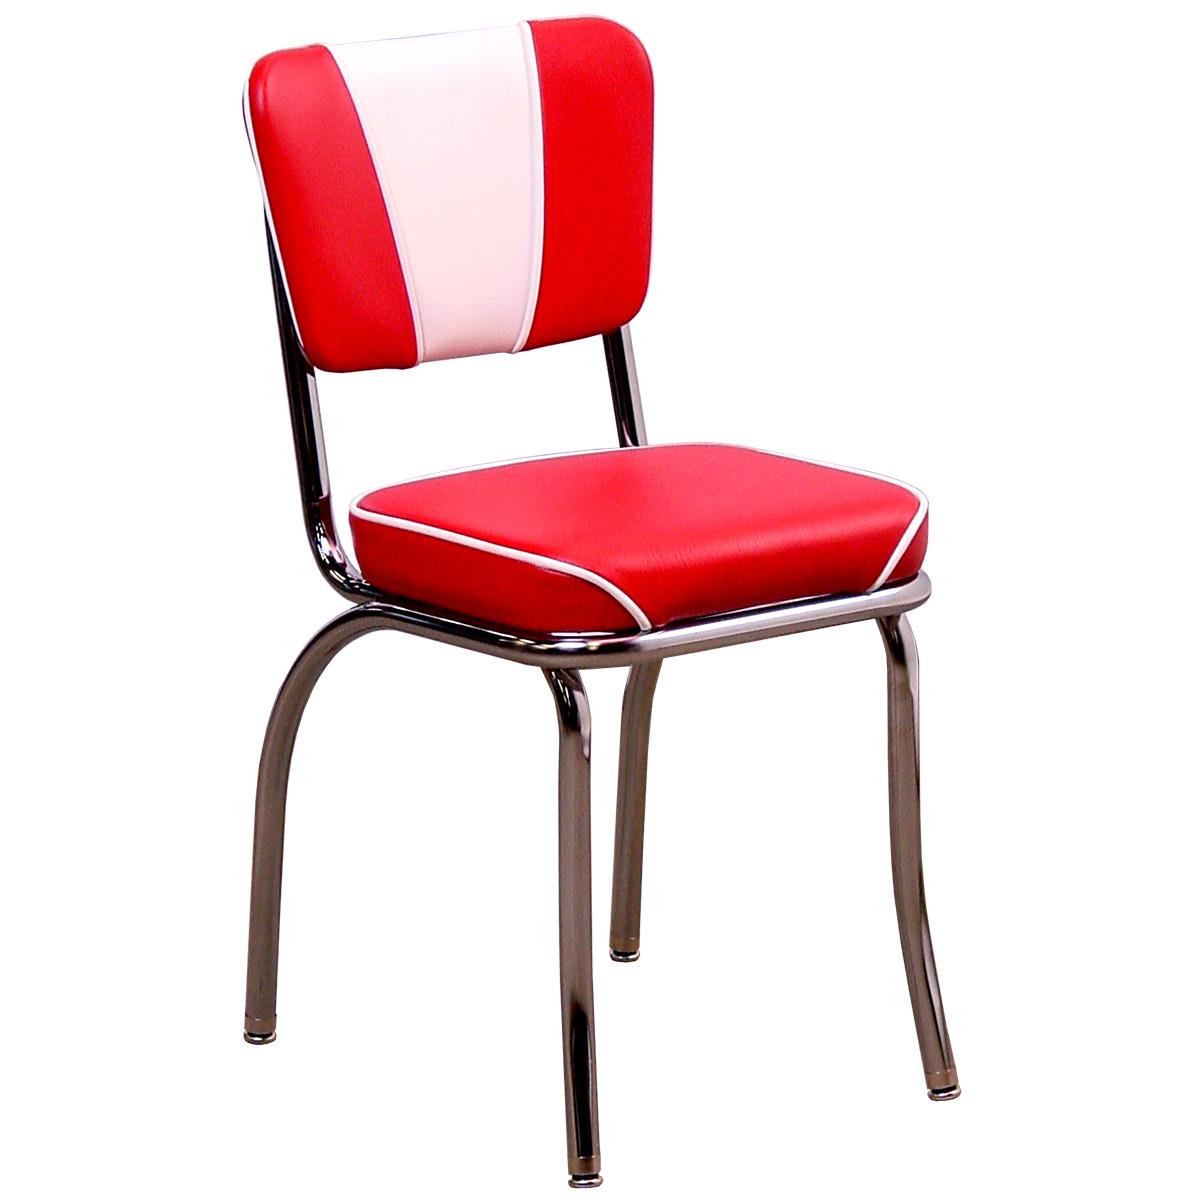 retro kitchen chairs photo - 7